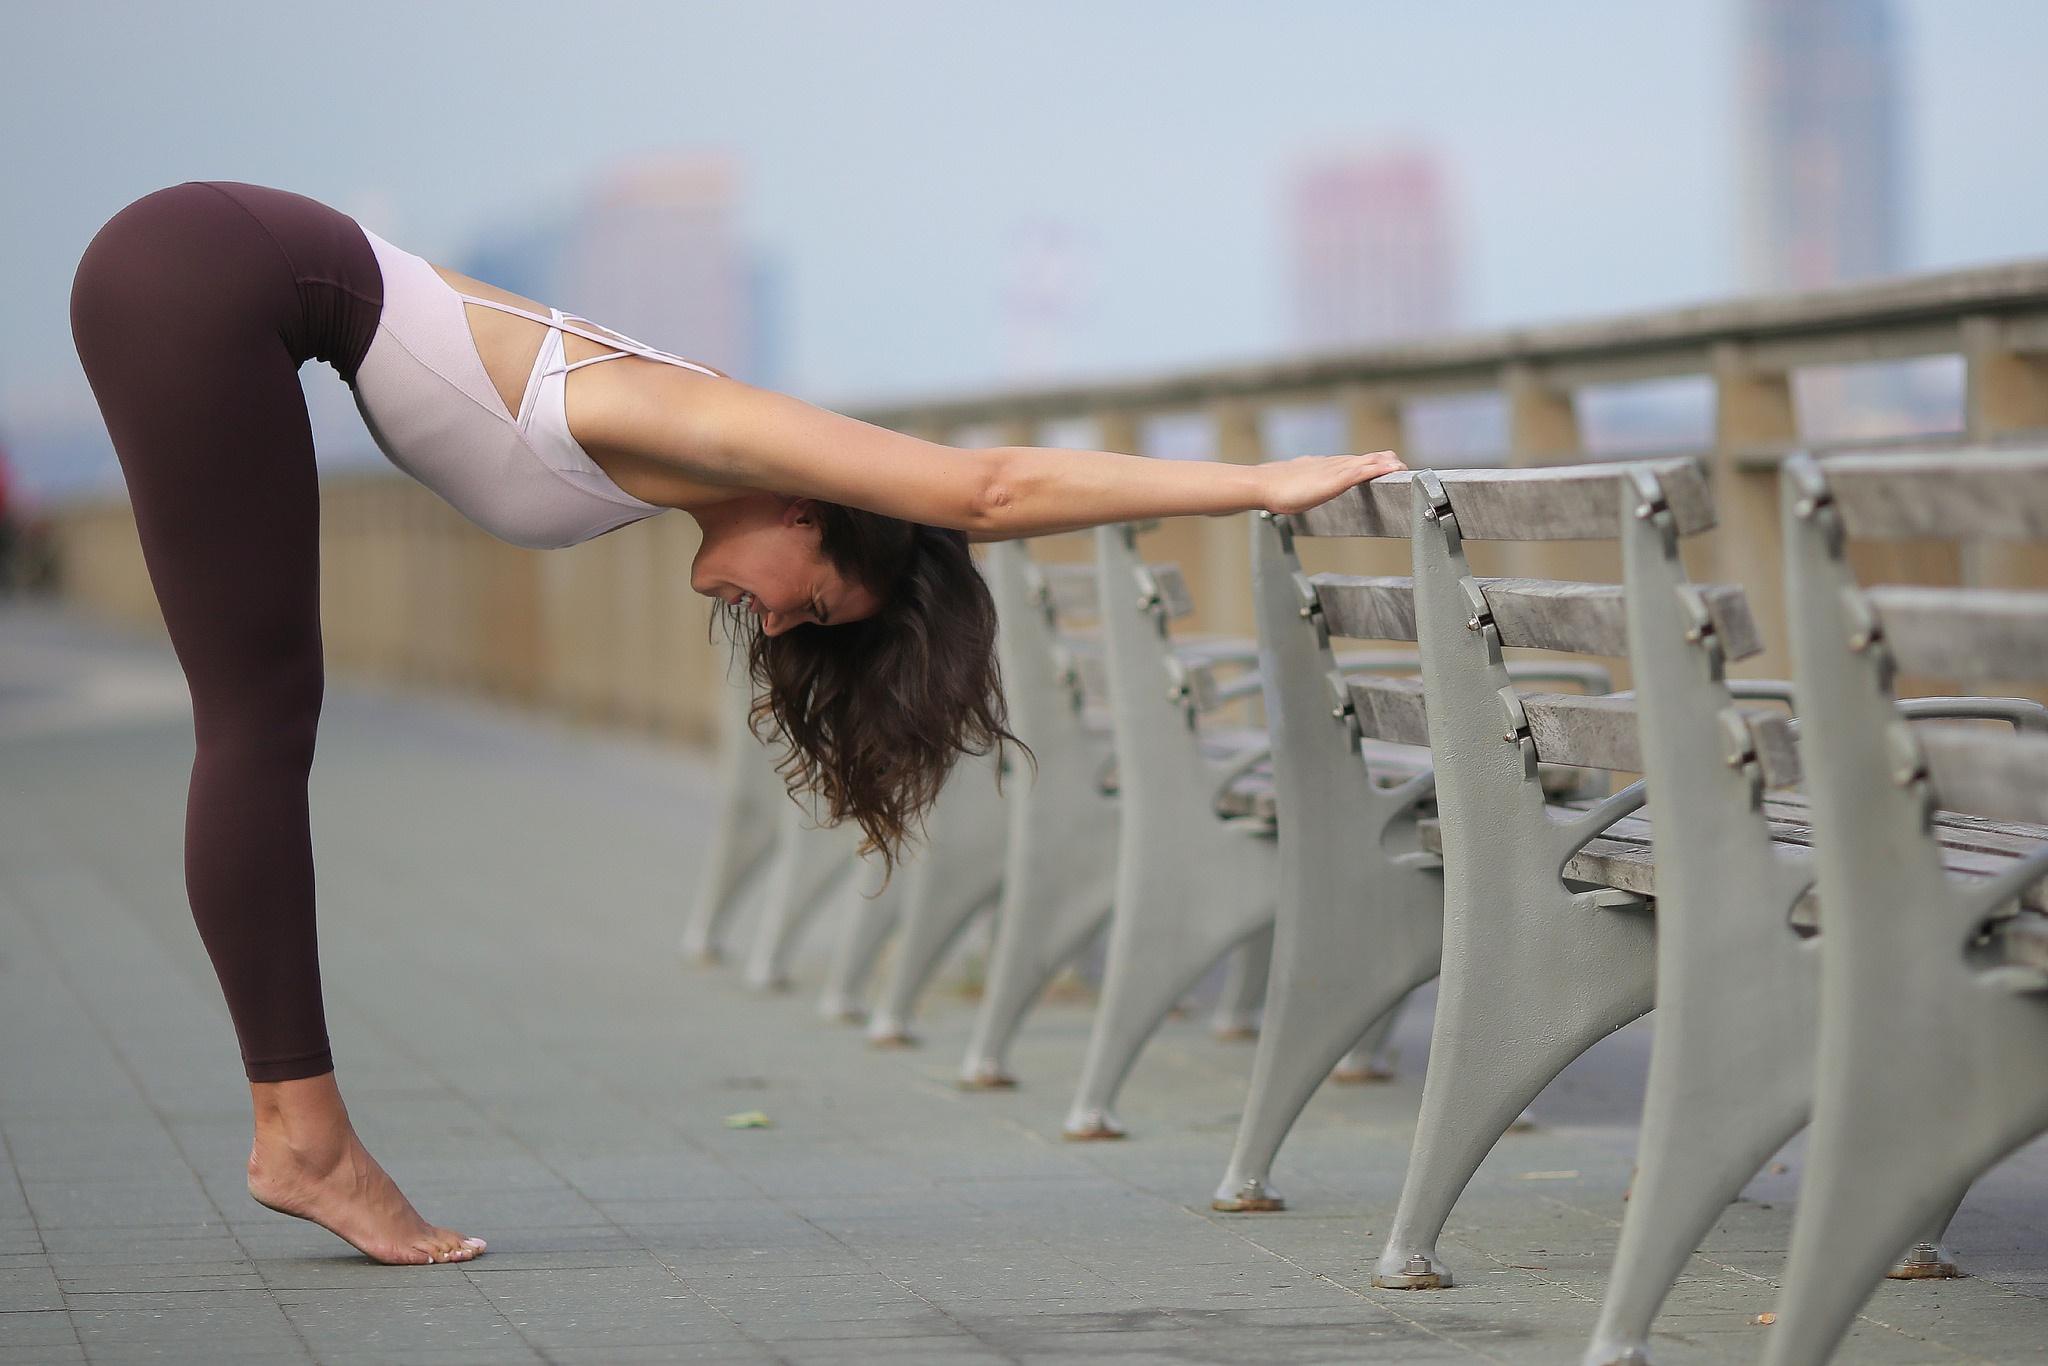 фото девушек гимнасток колготках